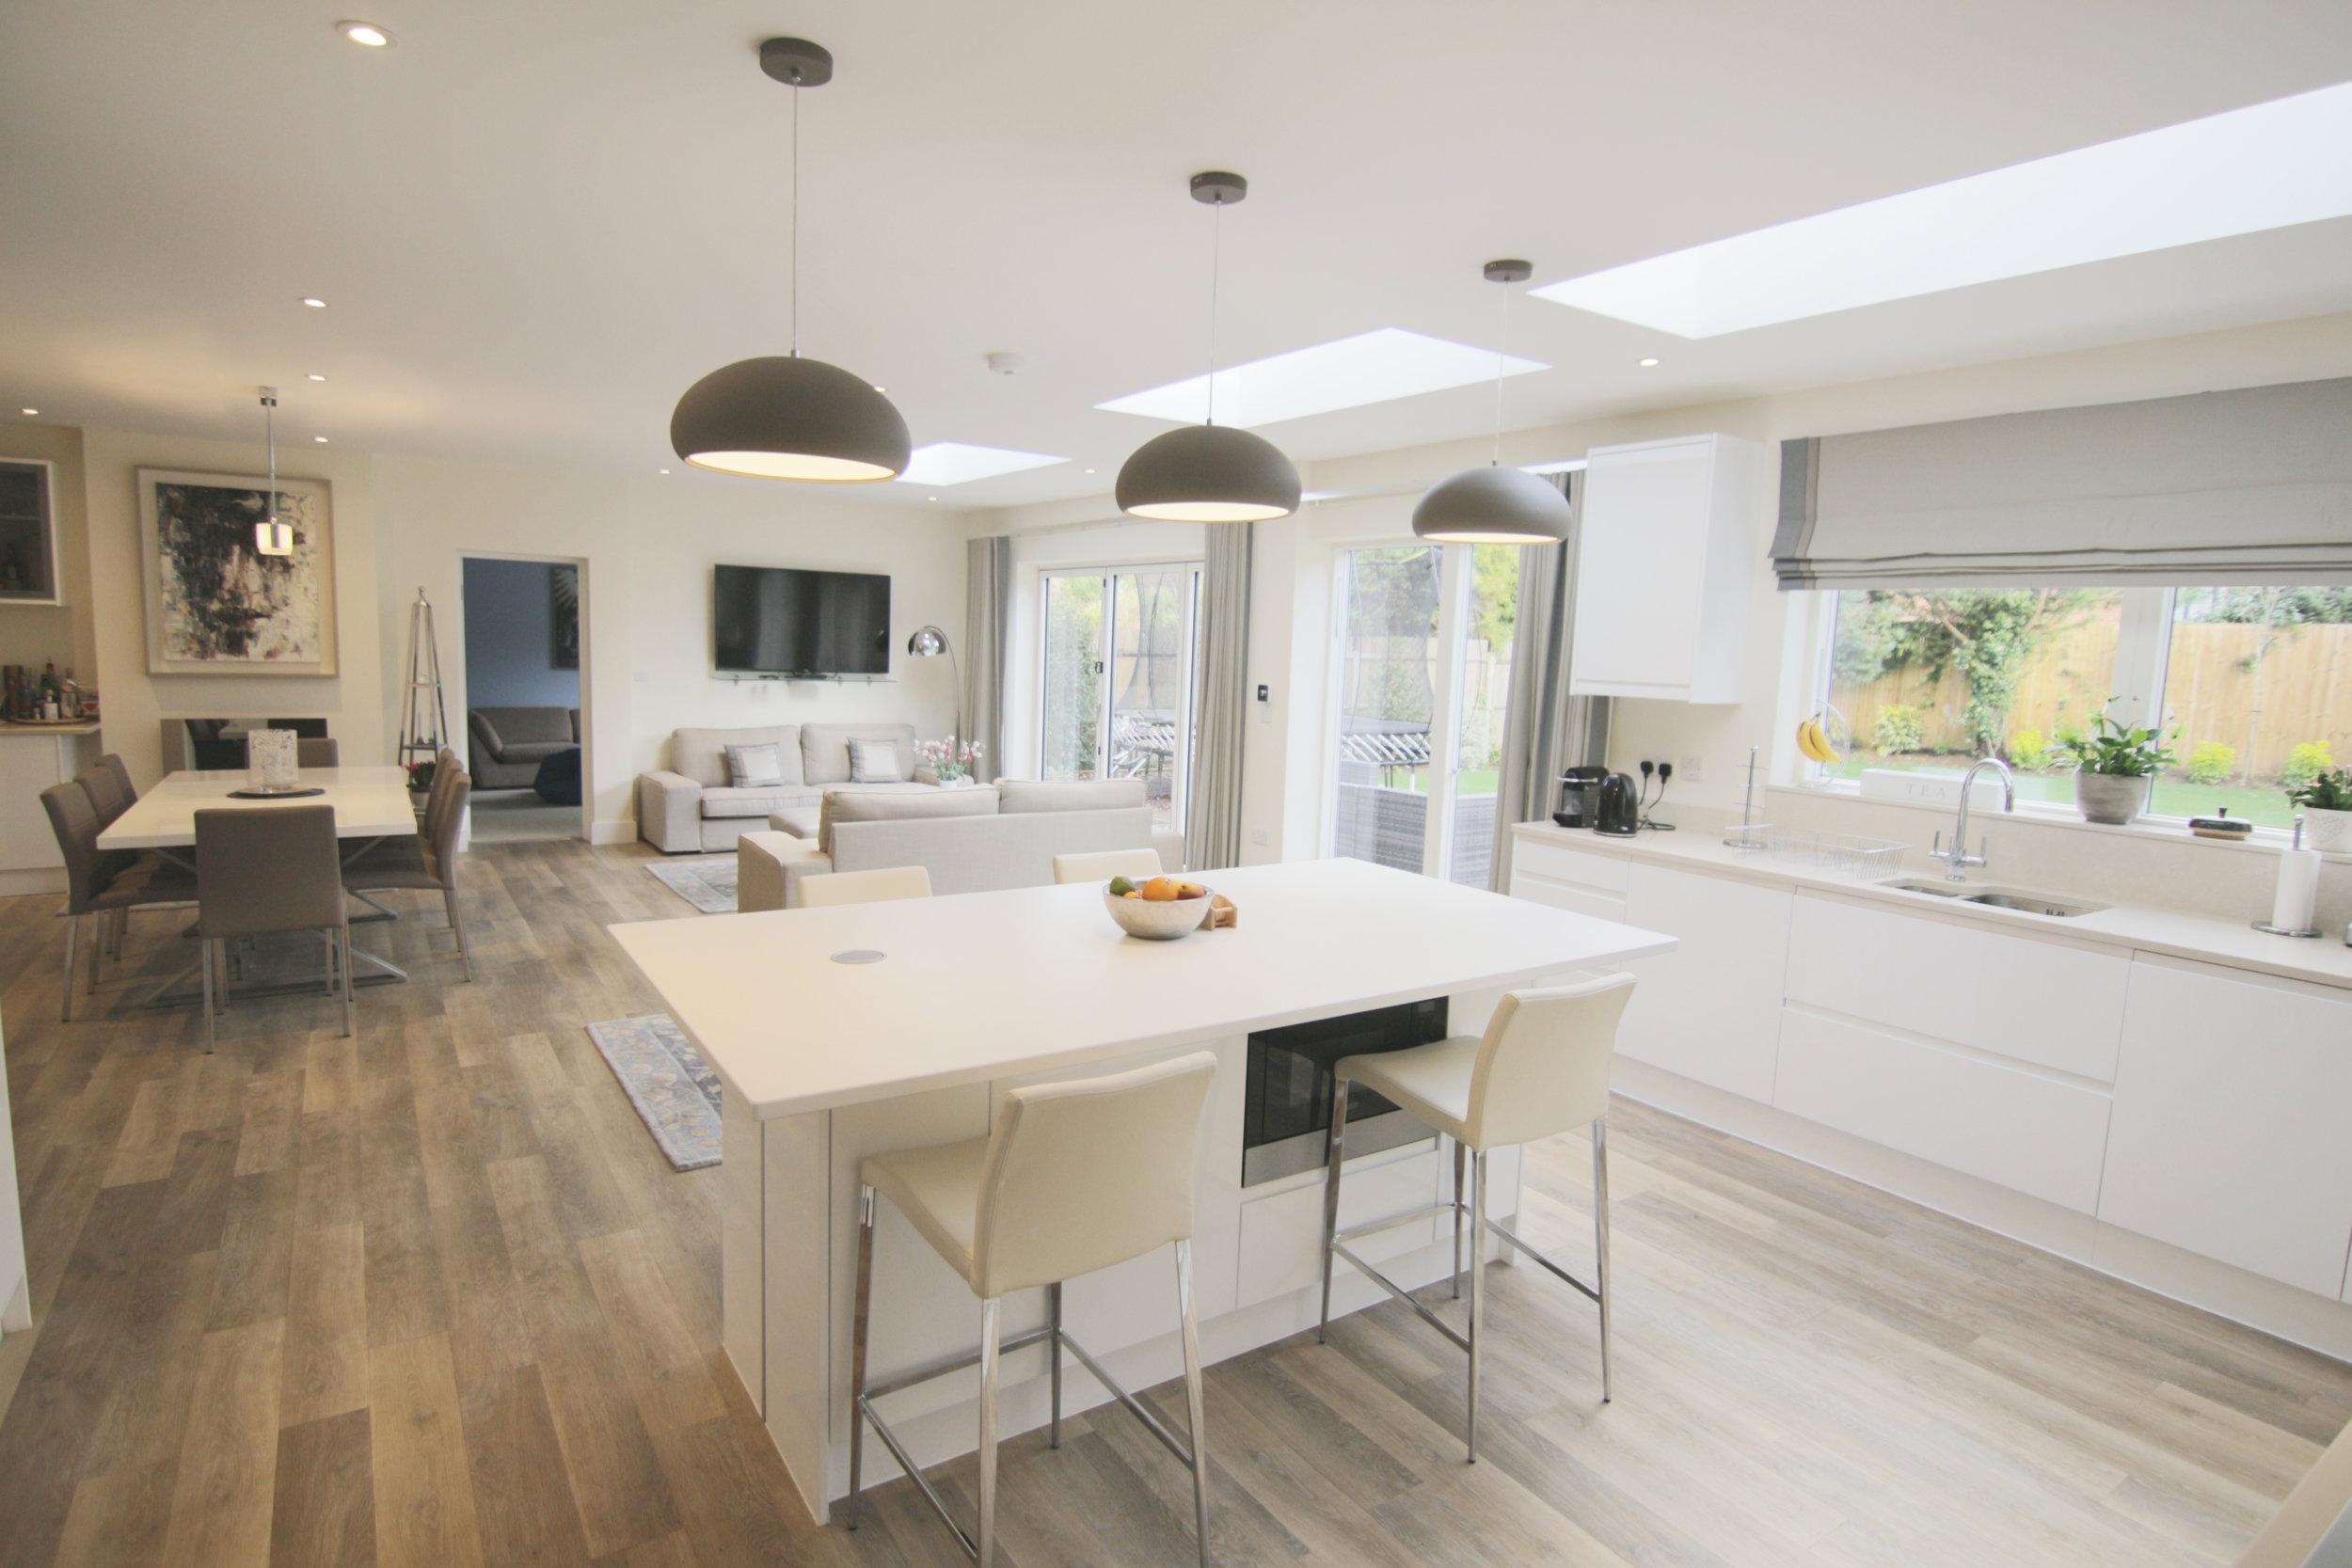 Amelia's House    Location: Dorking   Floor Area: 90m2 + Refurbishment   Budget: £250,000   Client: Amelia and Alex   View More